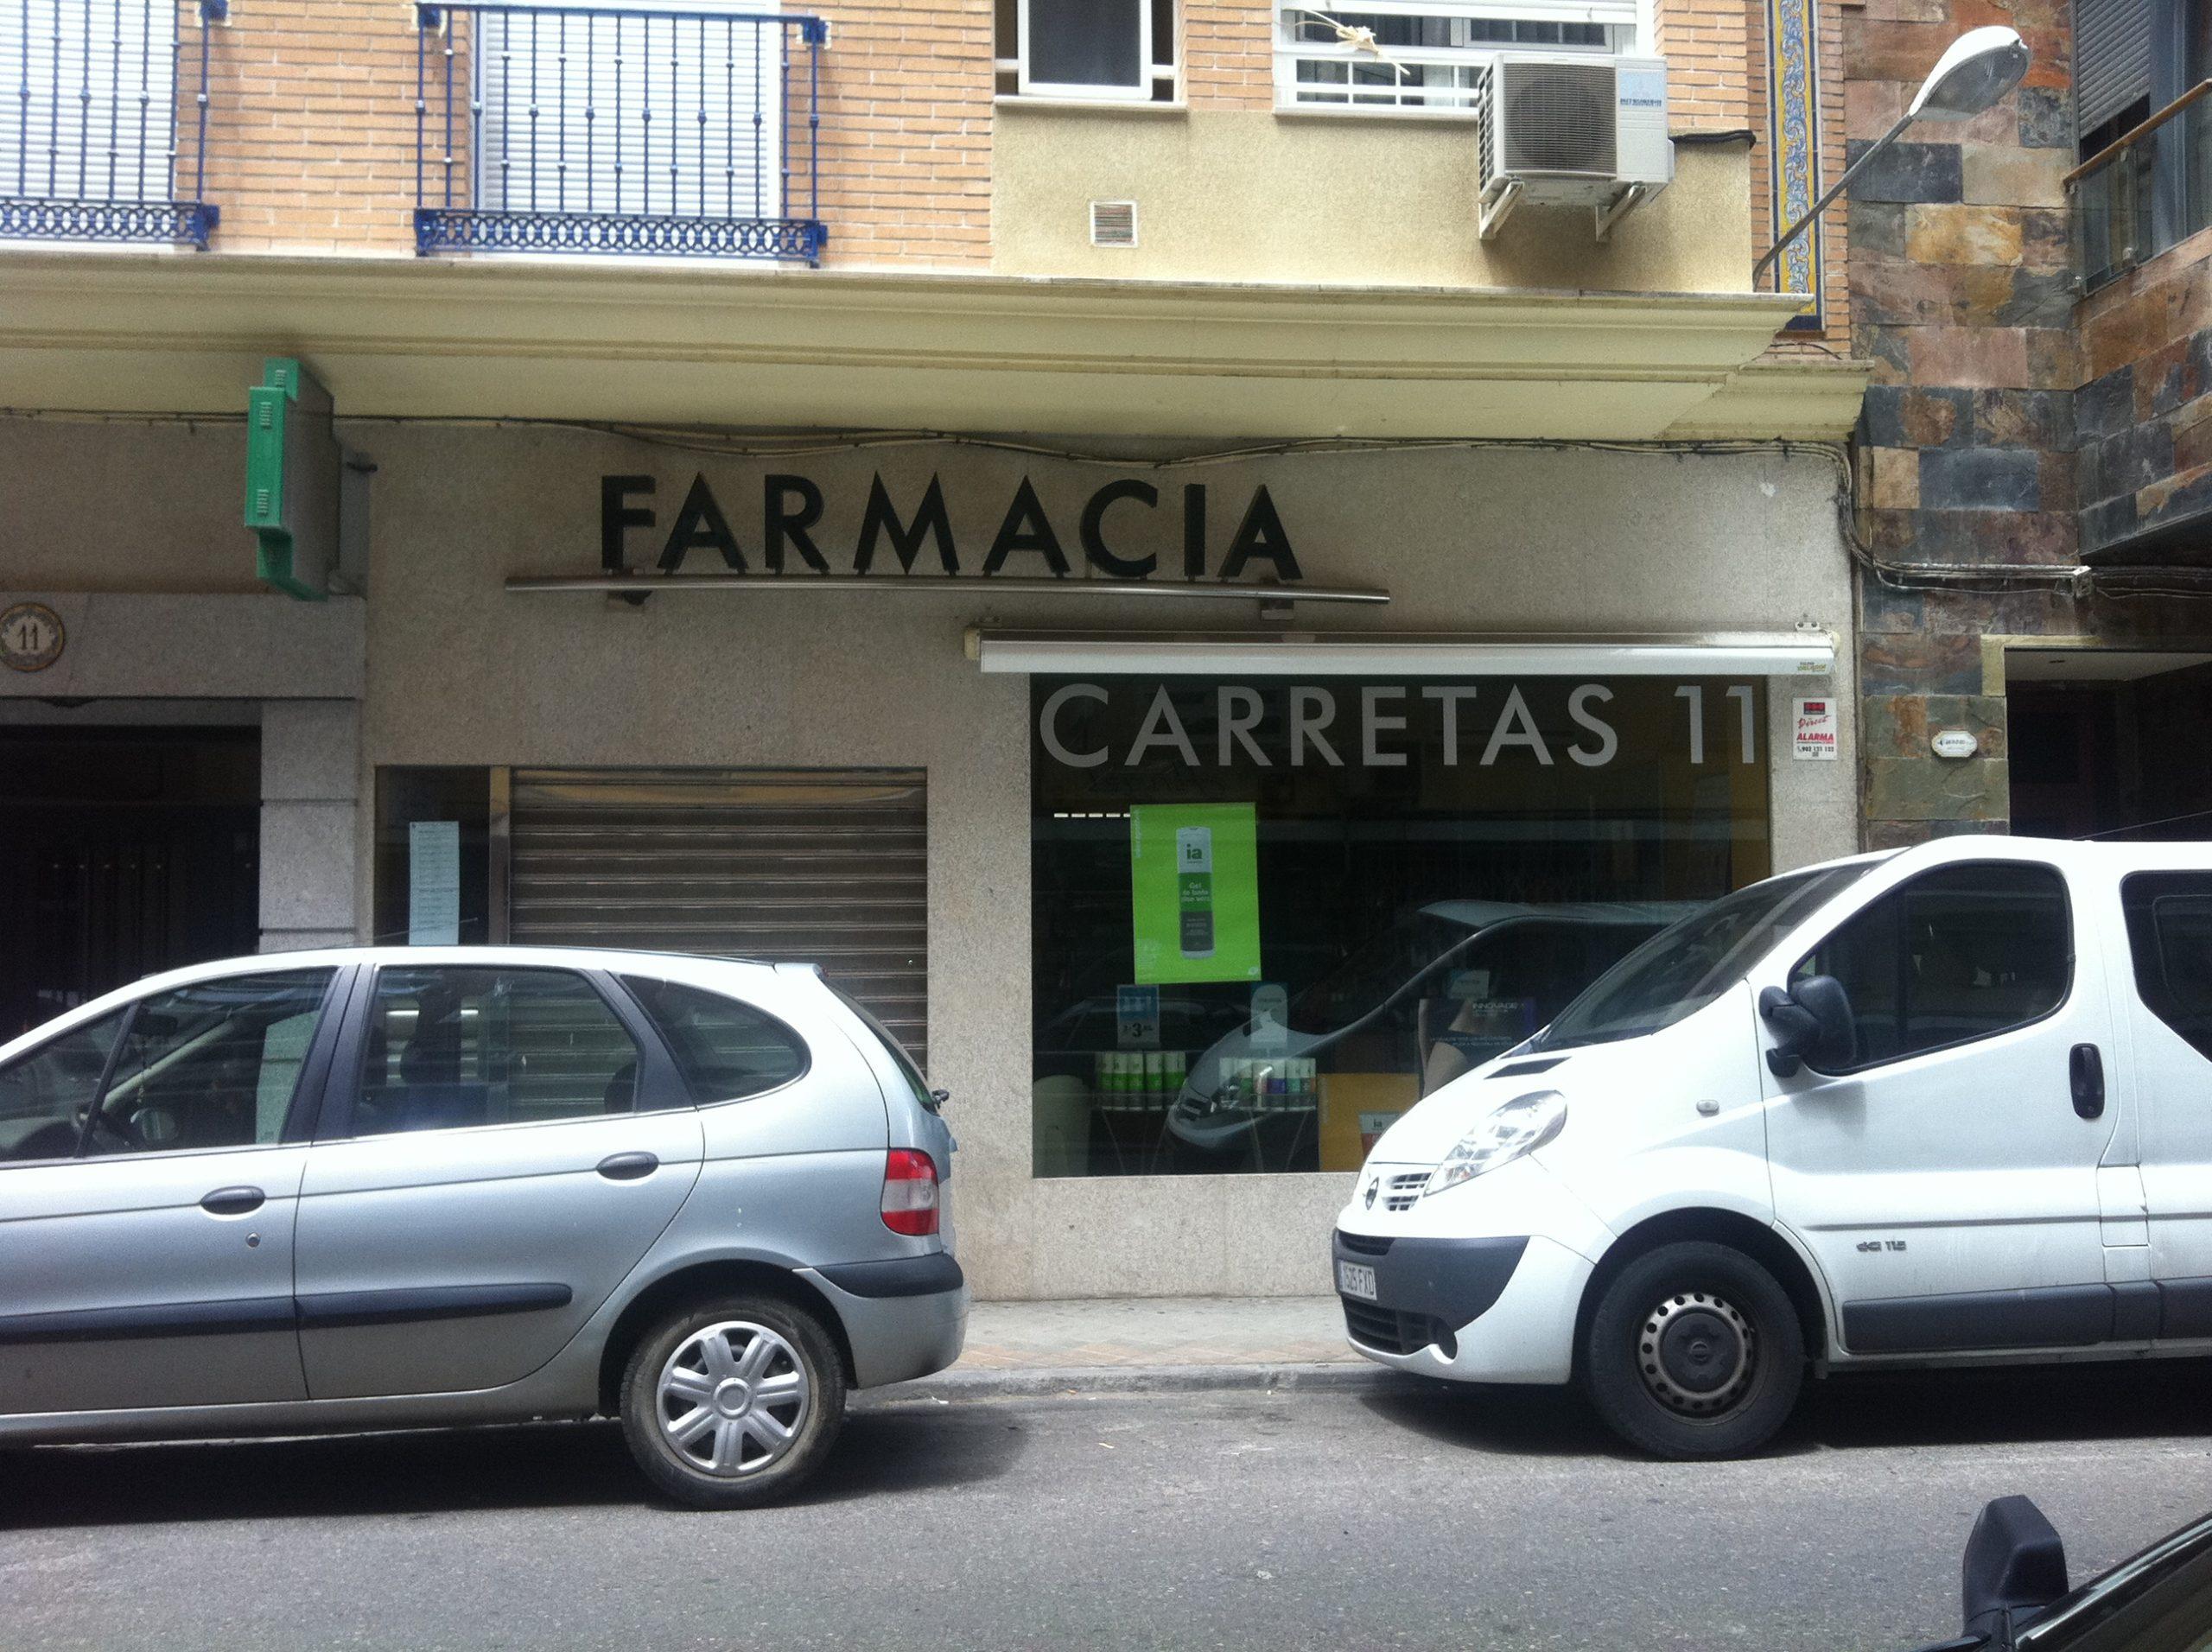 Farmacia vendida en Talavera de la Reina C/  Carretas